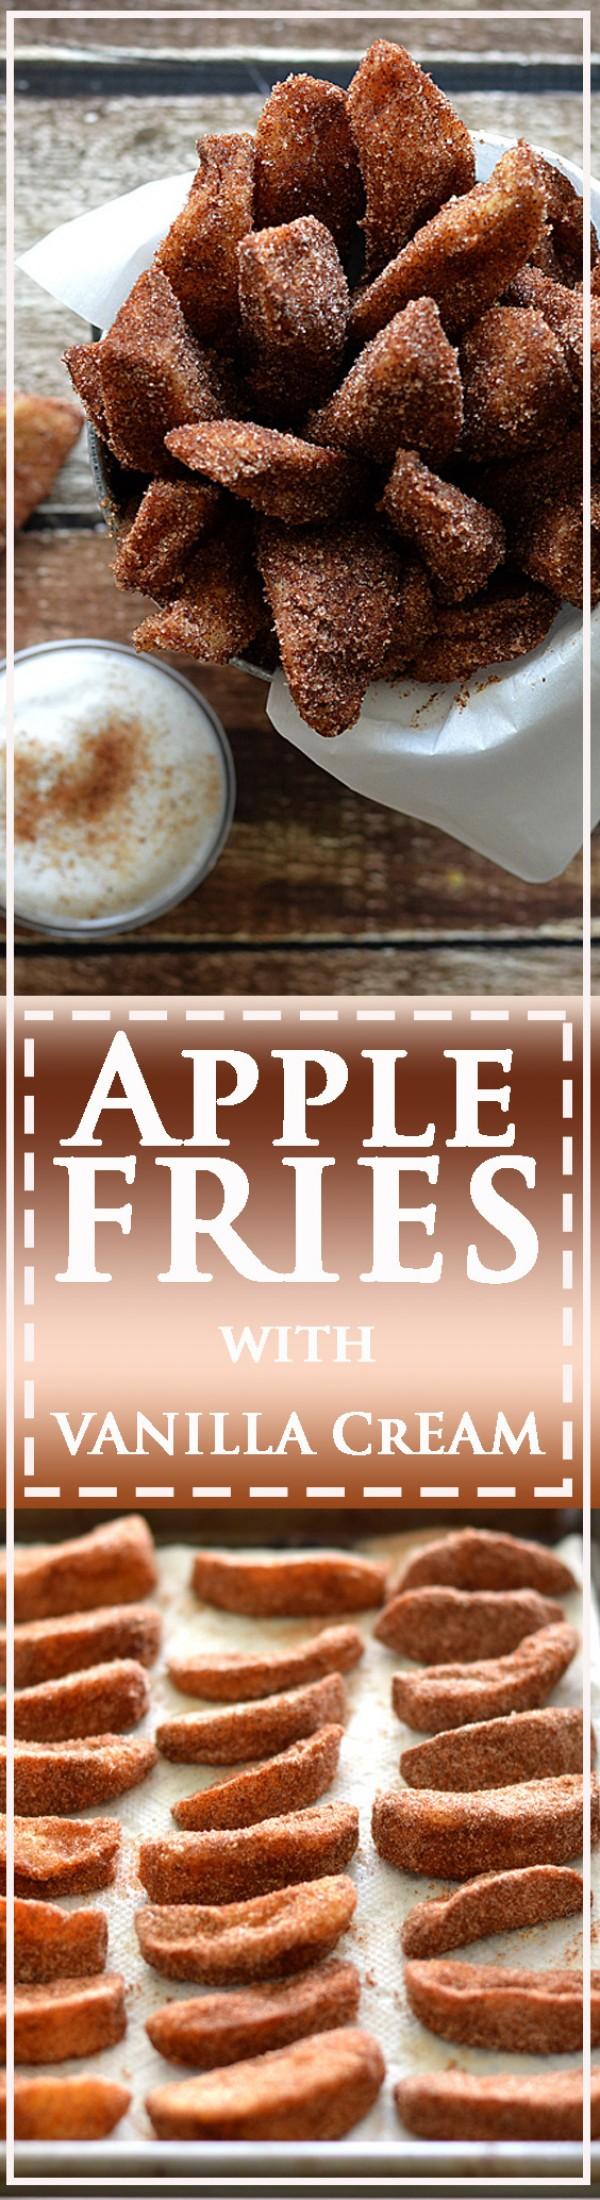 Get the recipe Apple Fries with Vanilla Cream @recipes_to_go